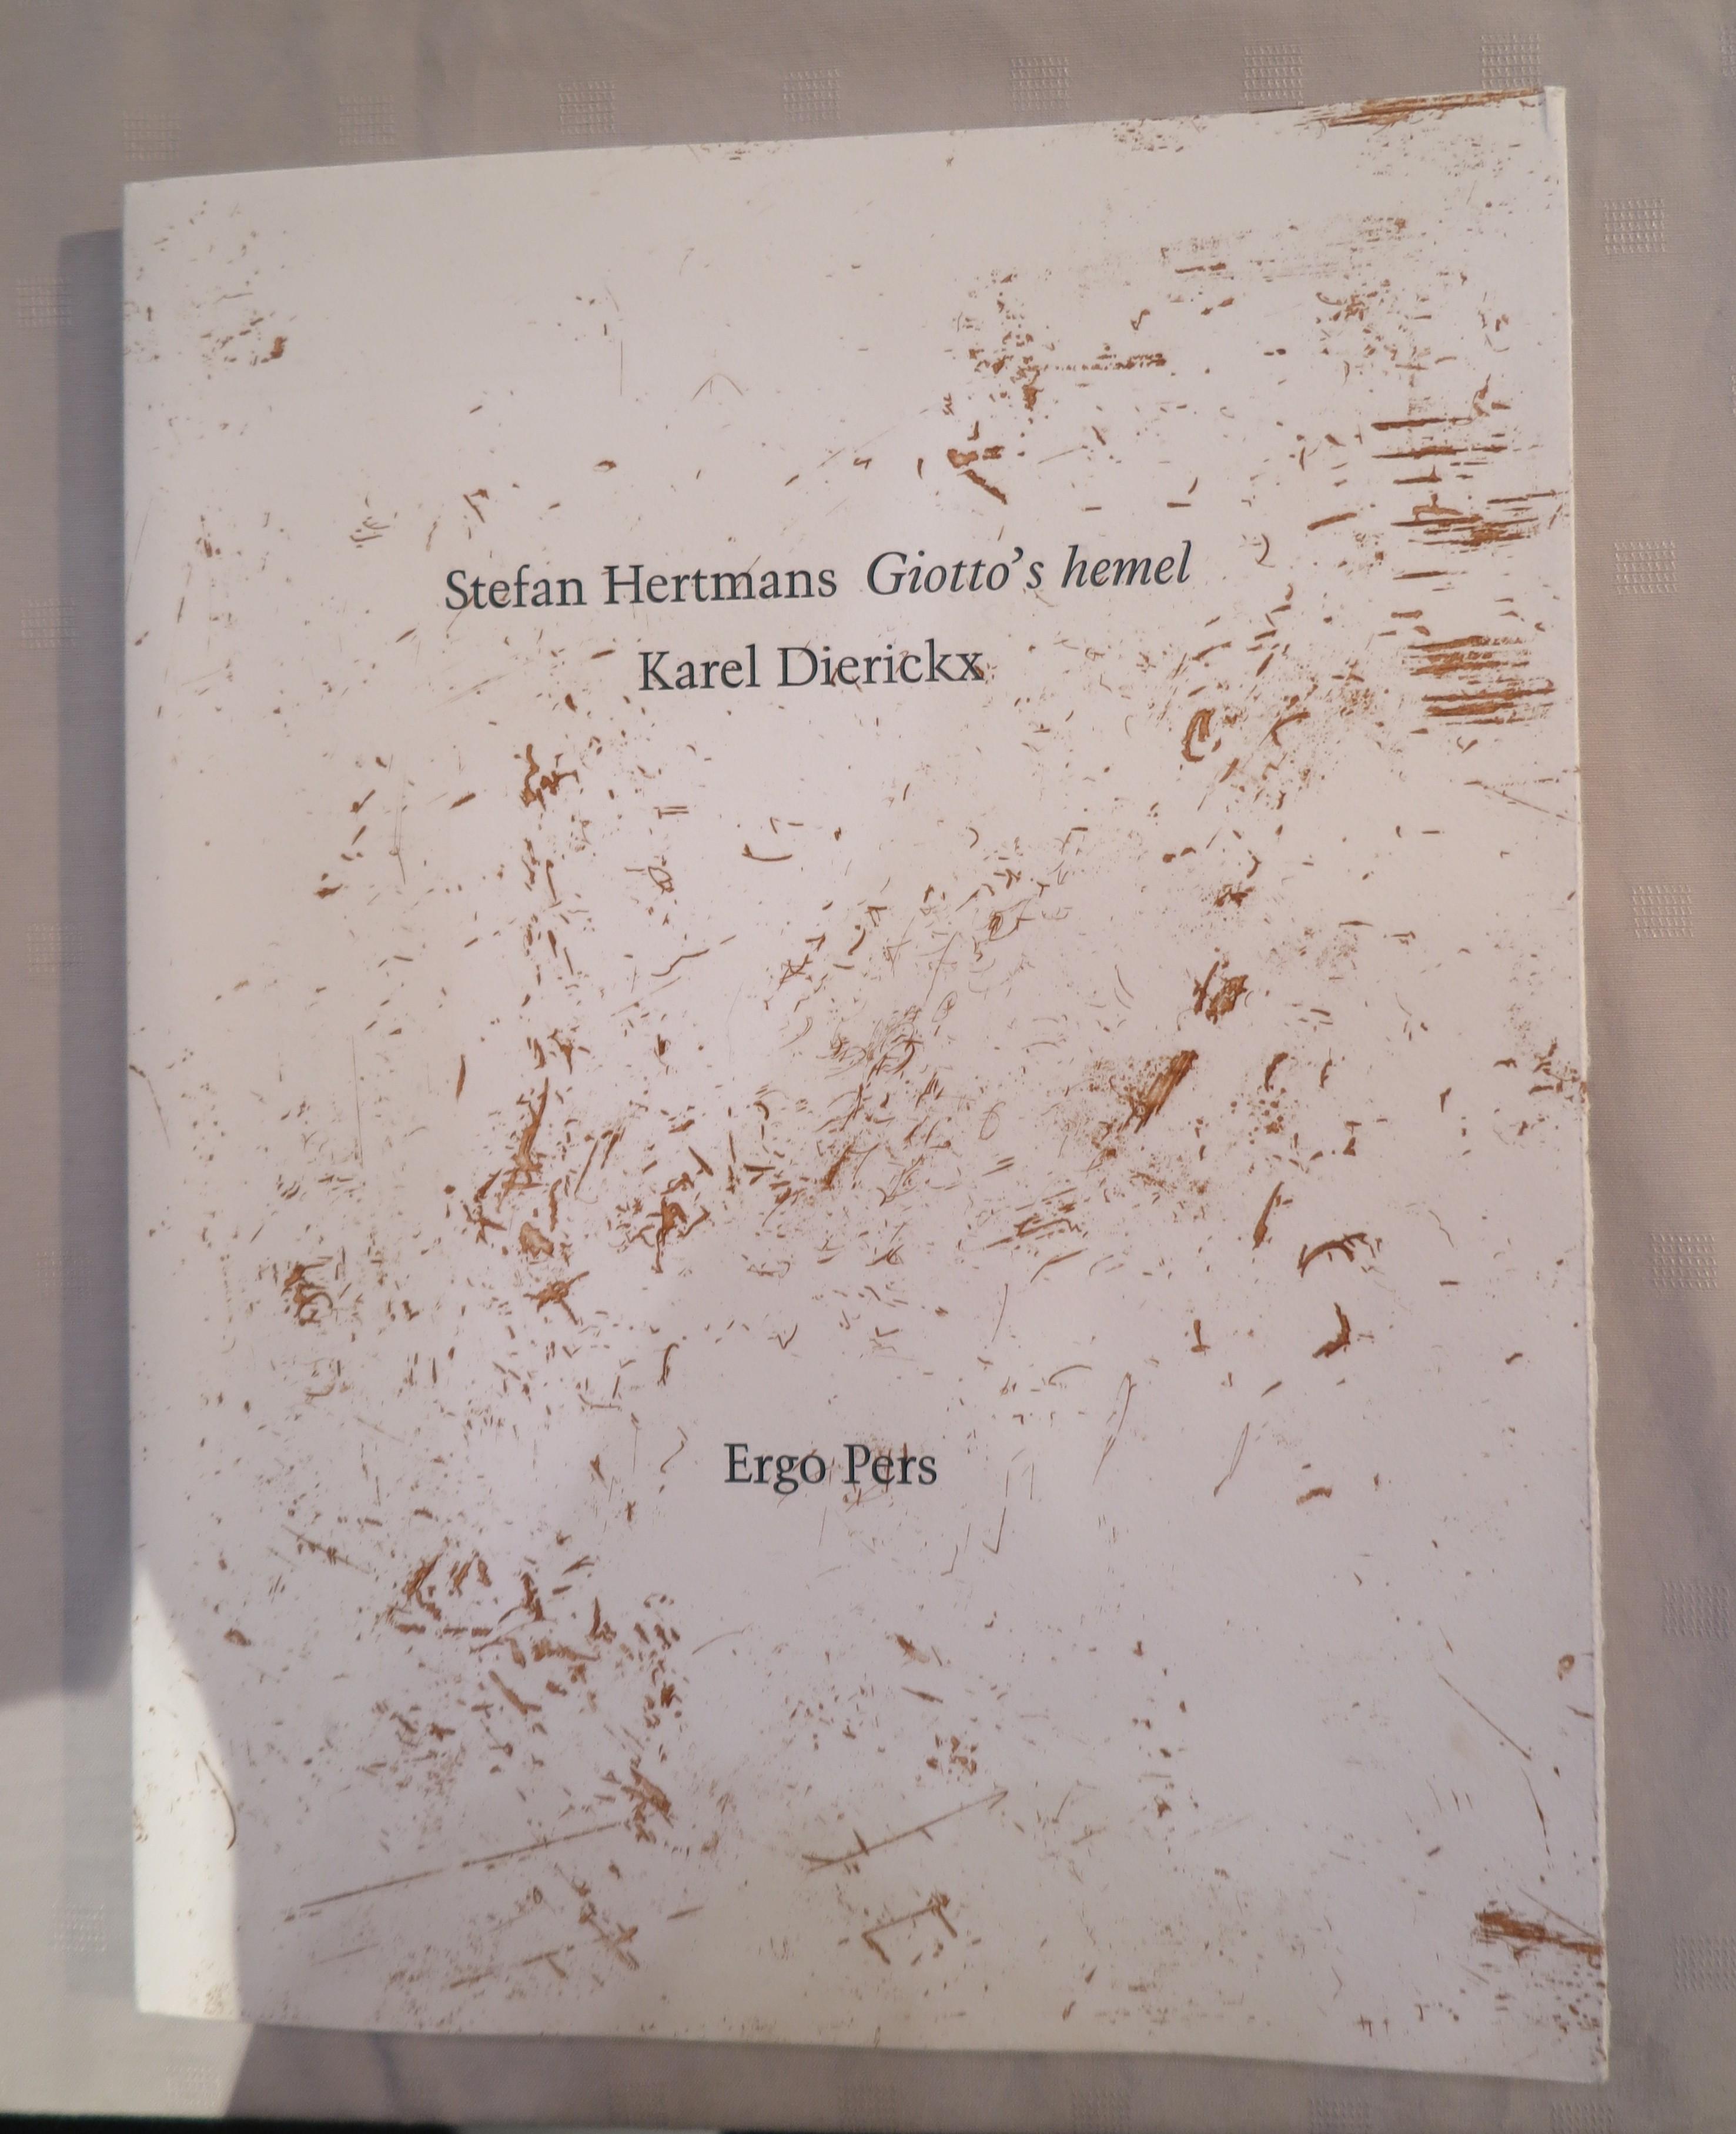 Stefan Hertmans Giotto's hemel / Karel Dierickx - Ergo Pres